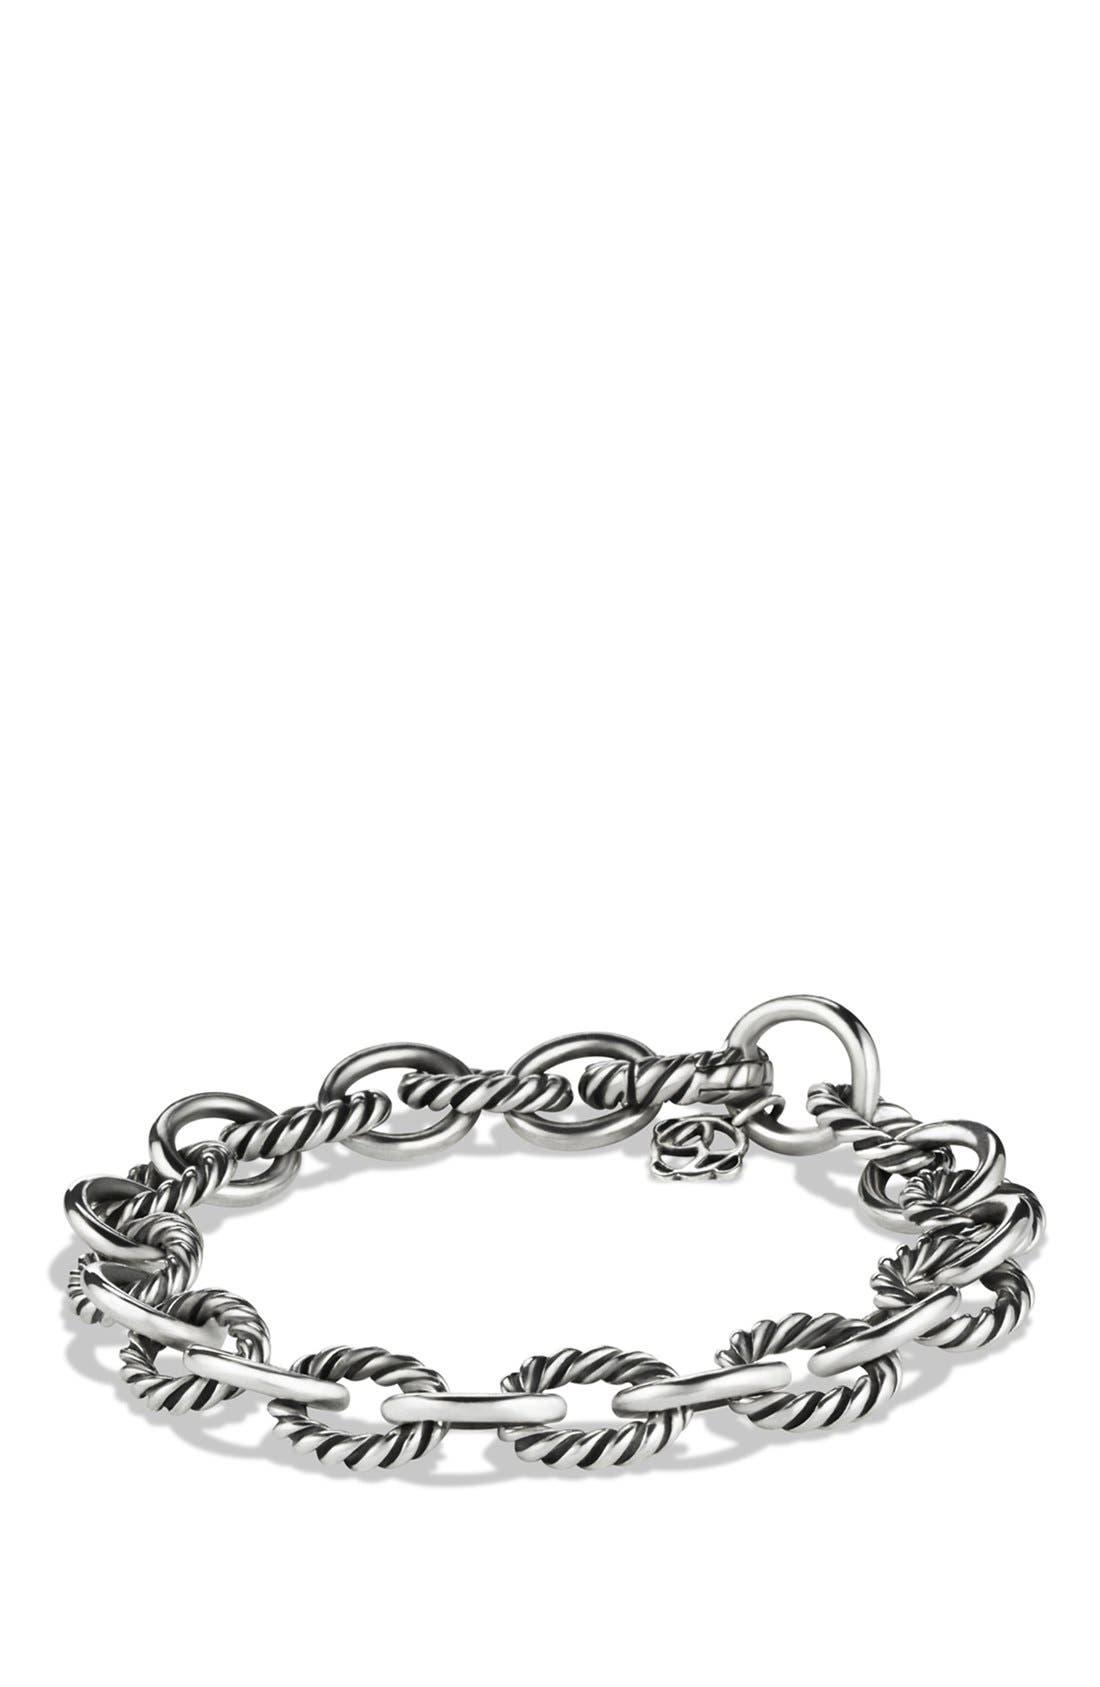 DAVID YURMAN 'Oval' Link Bracelet, Main, color, SILVER